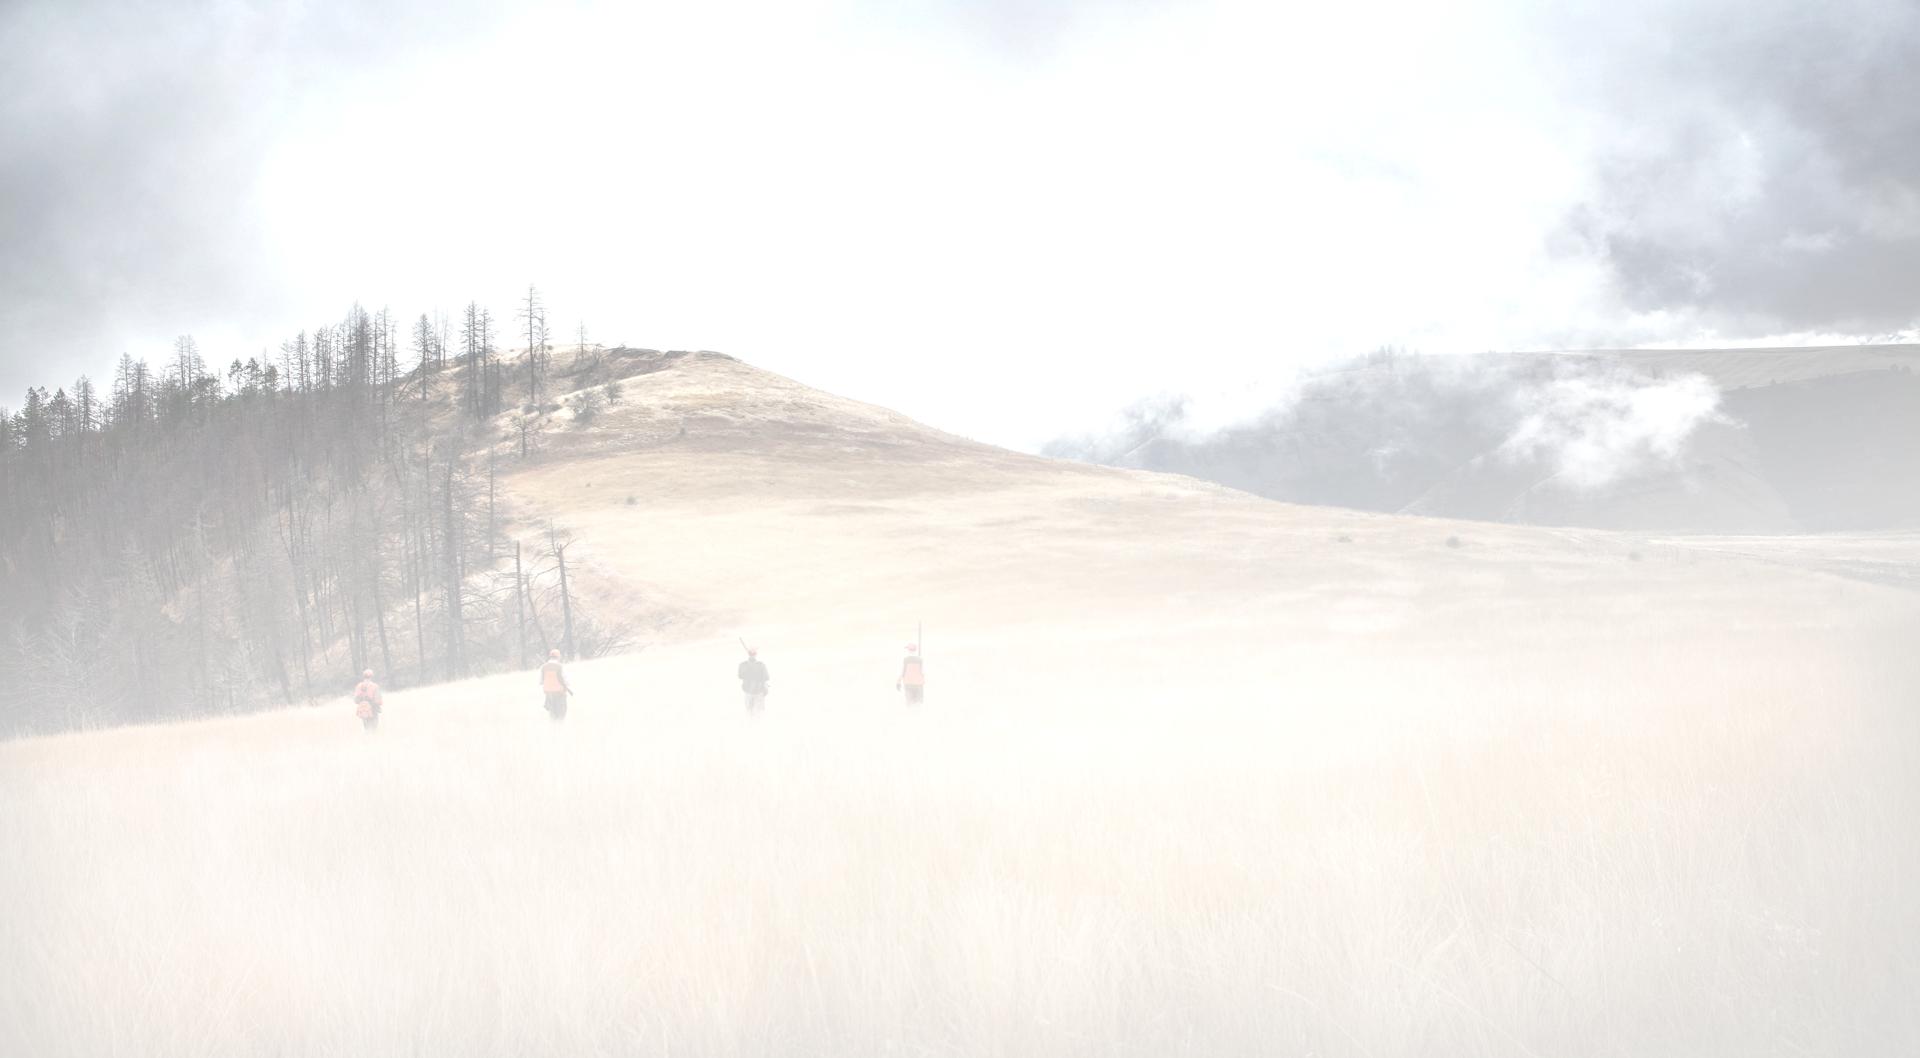 upland bird hunting scene